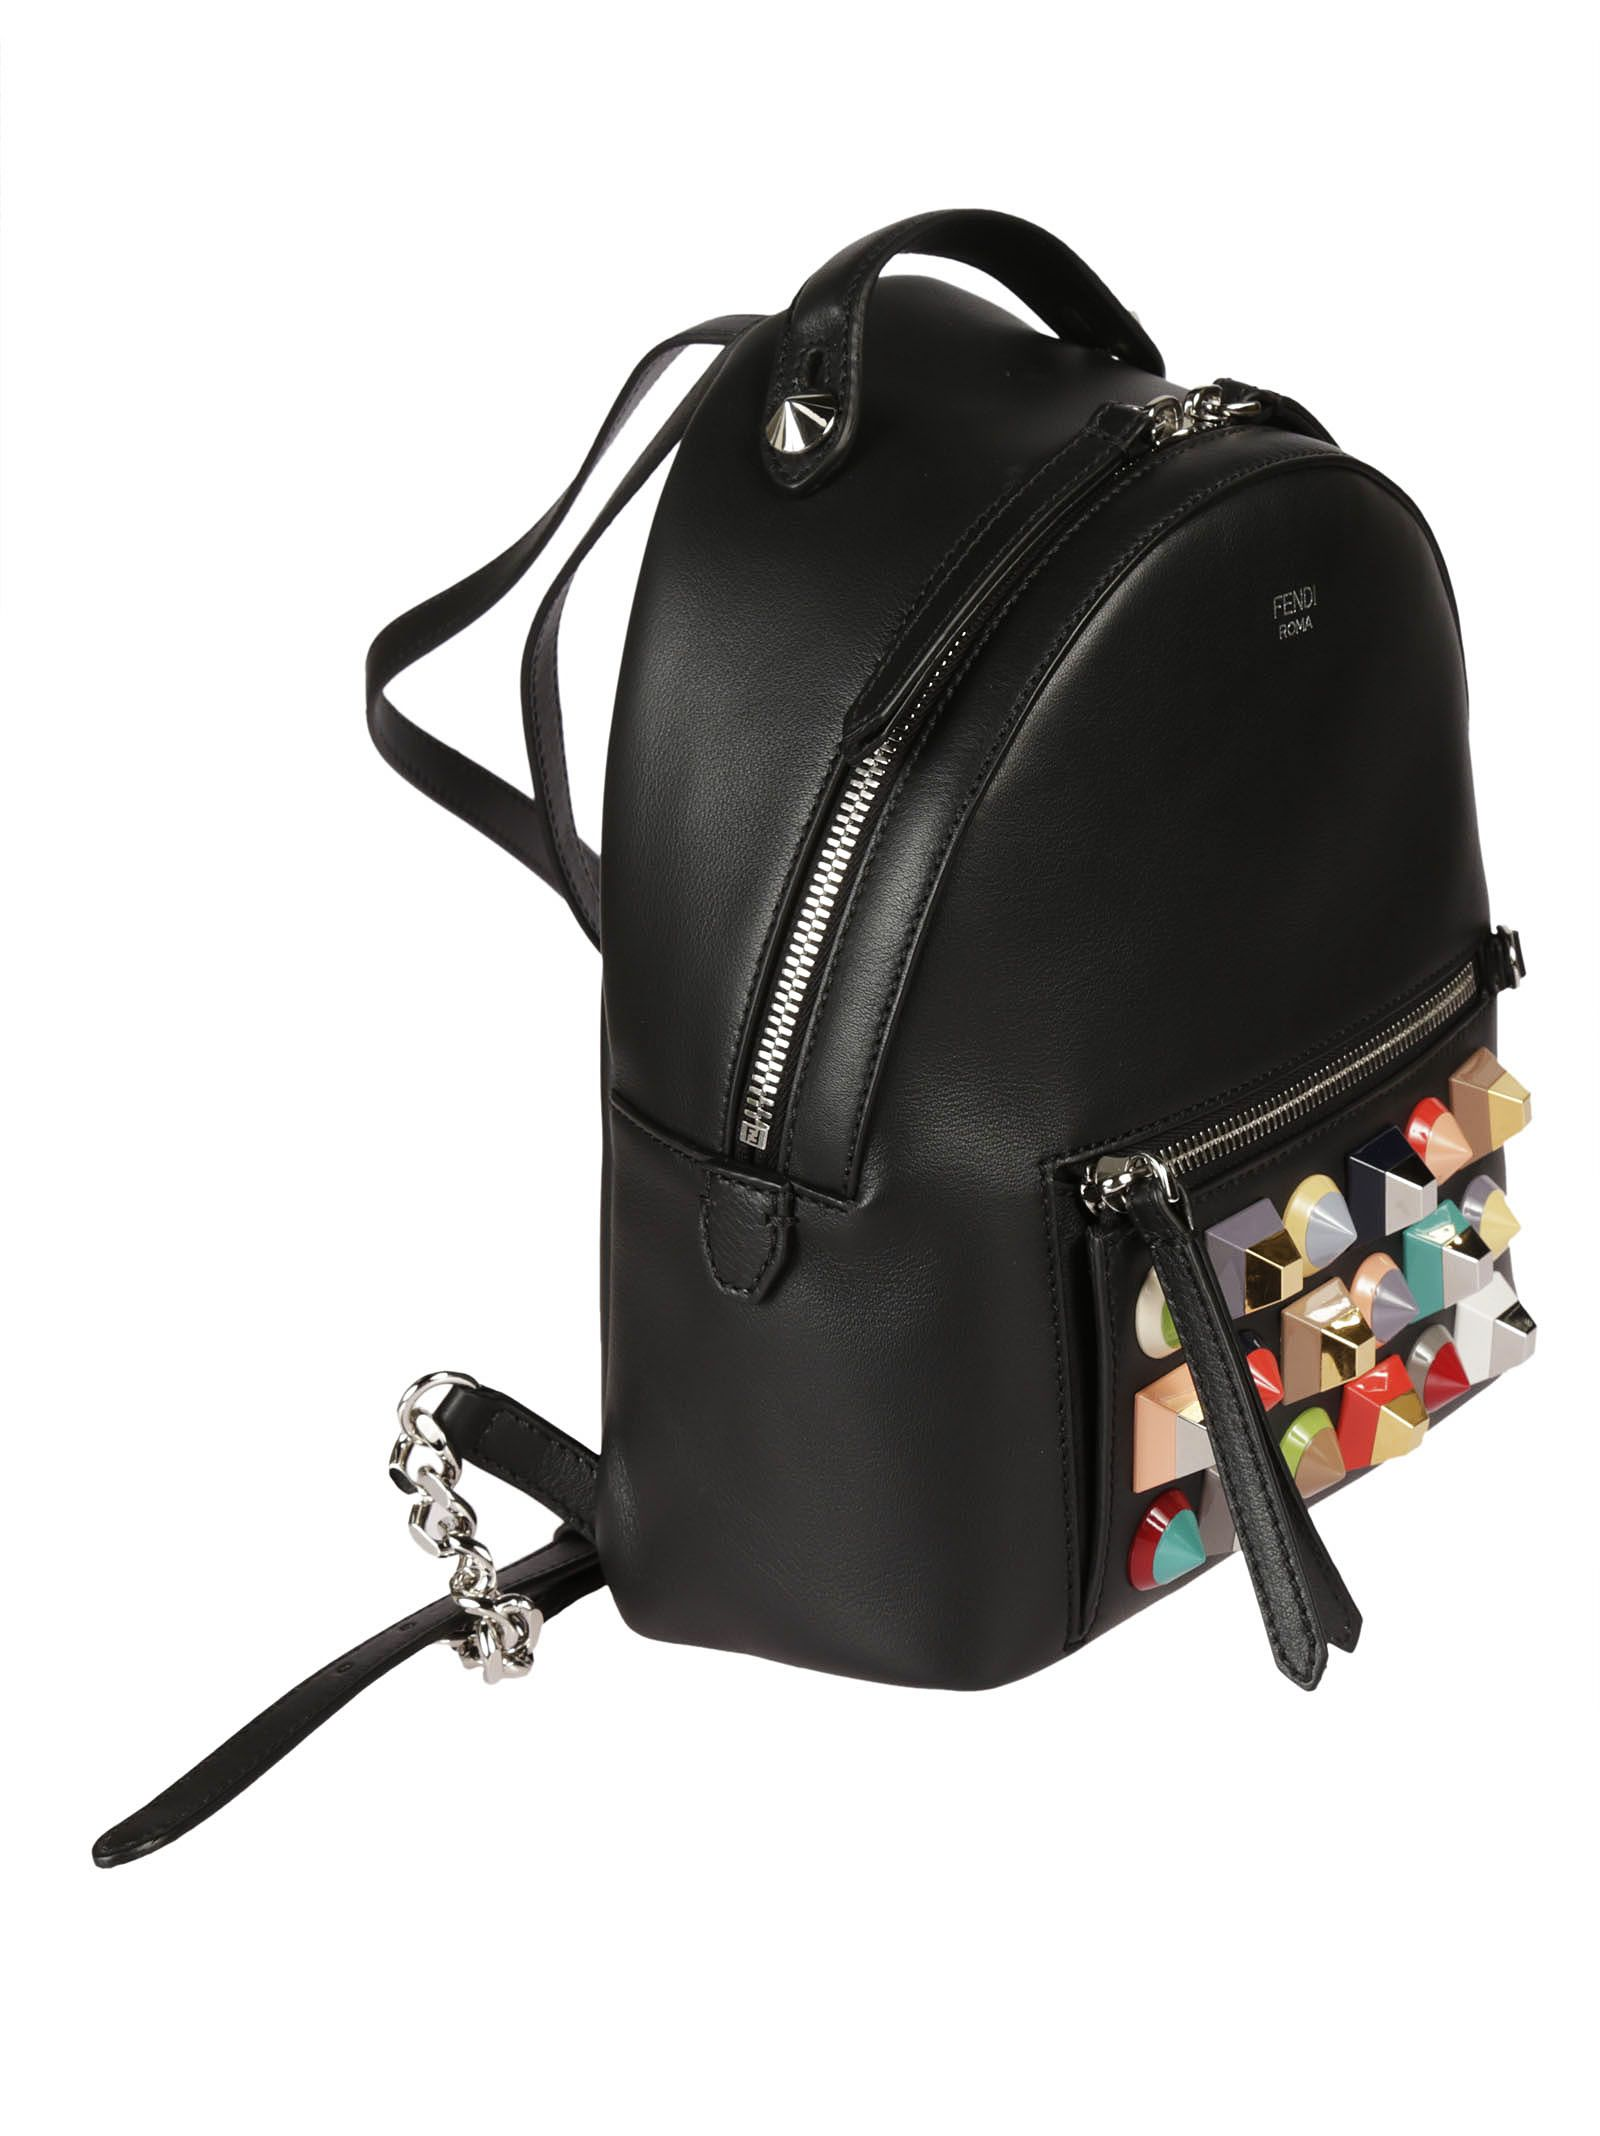 Fendi Fendi Mini Pyramid Studded Backpack - Black - 6622293  c5078b710273e